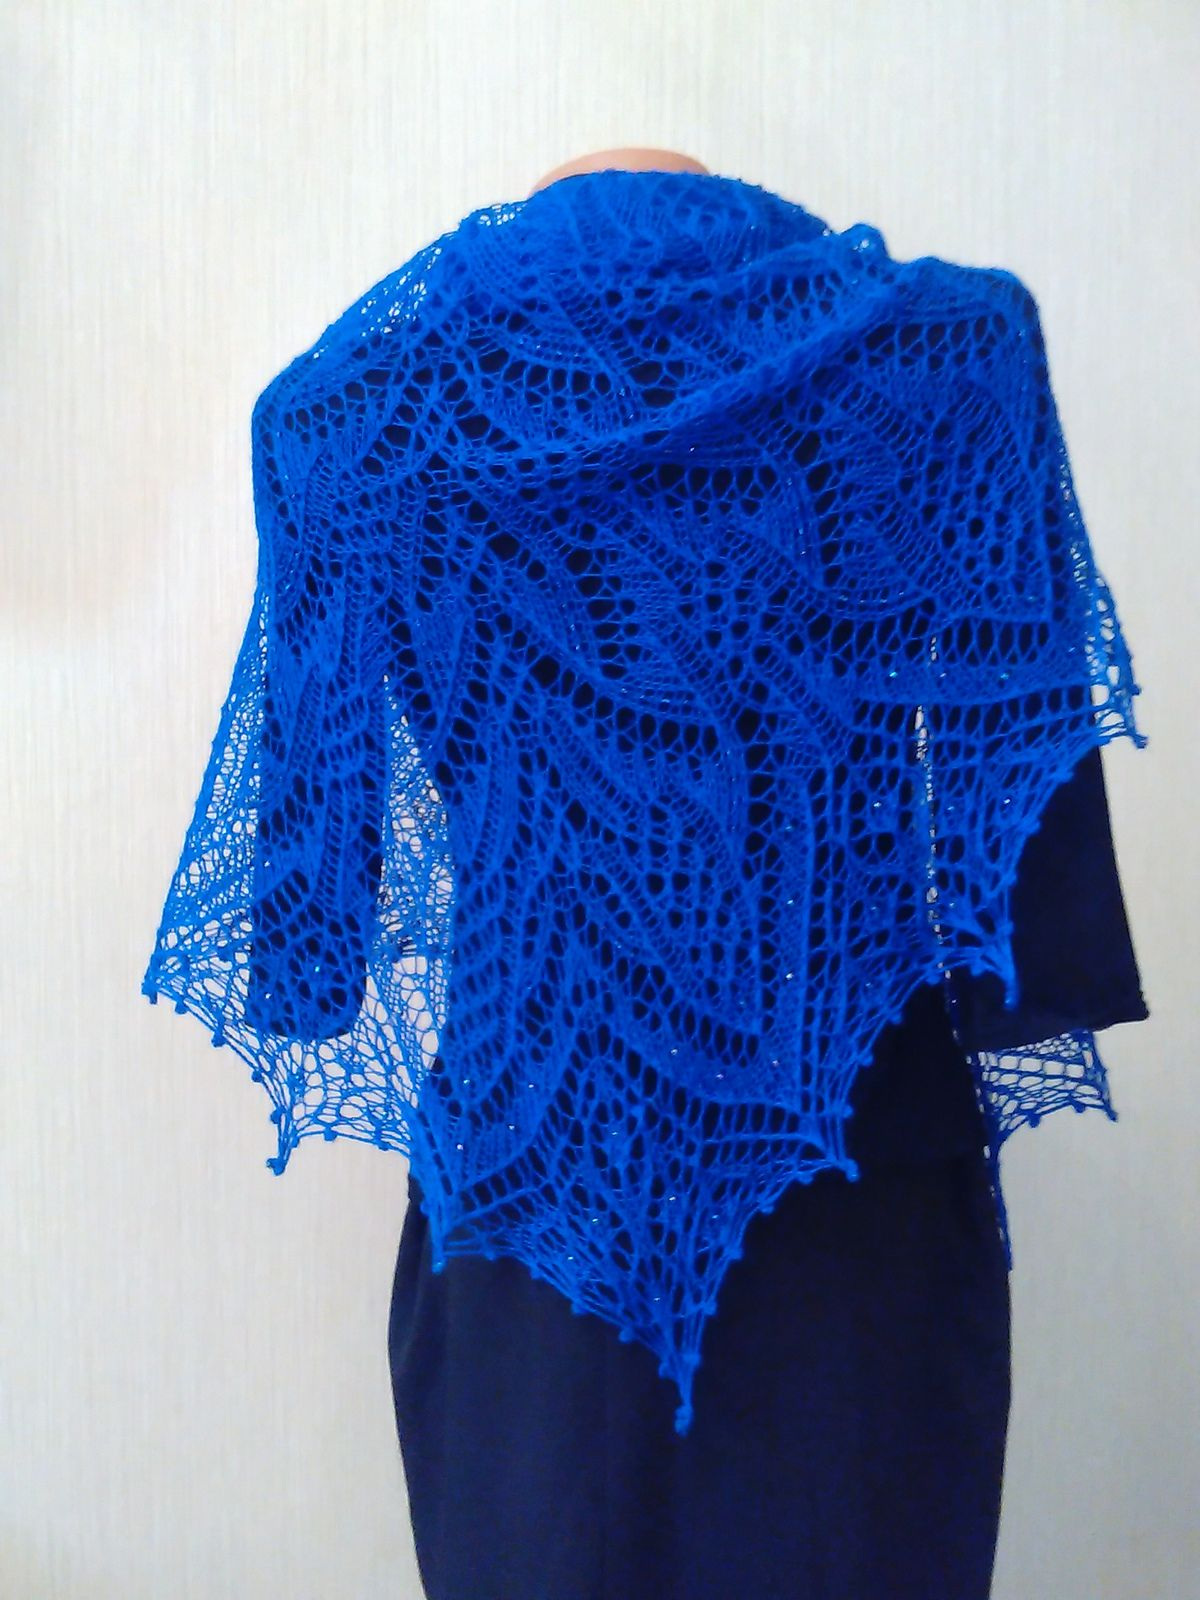 Ravelry: The Stone Flower by Alla Borisova   Knitting Patterns ...